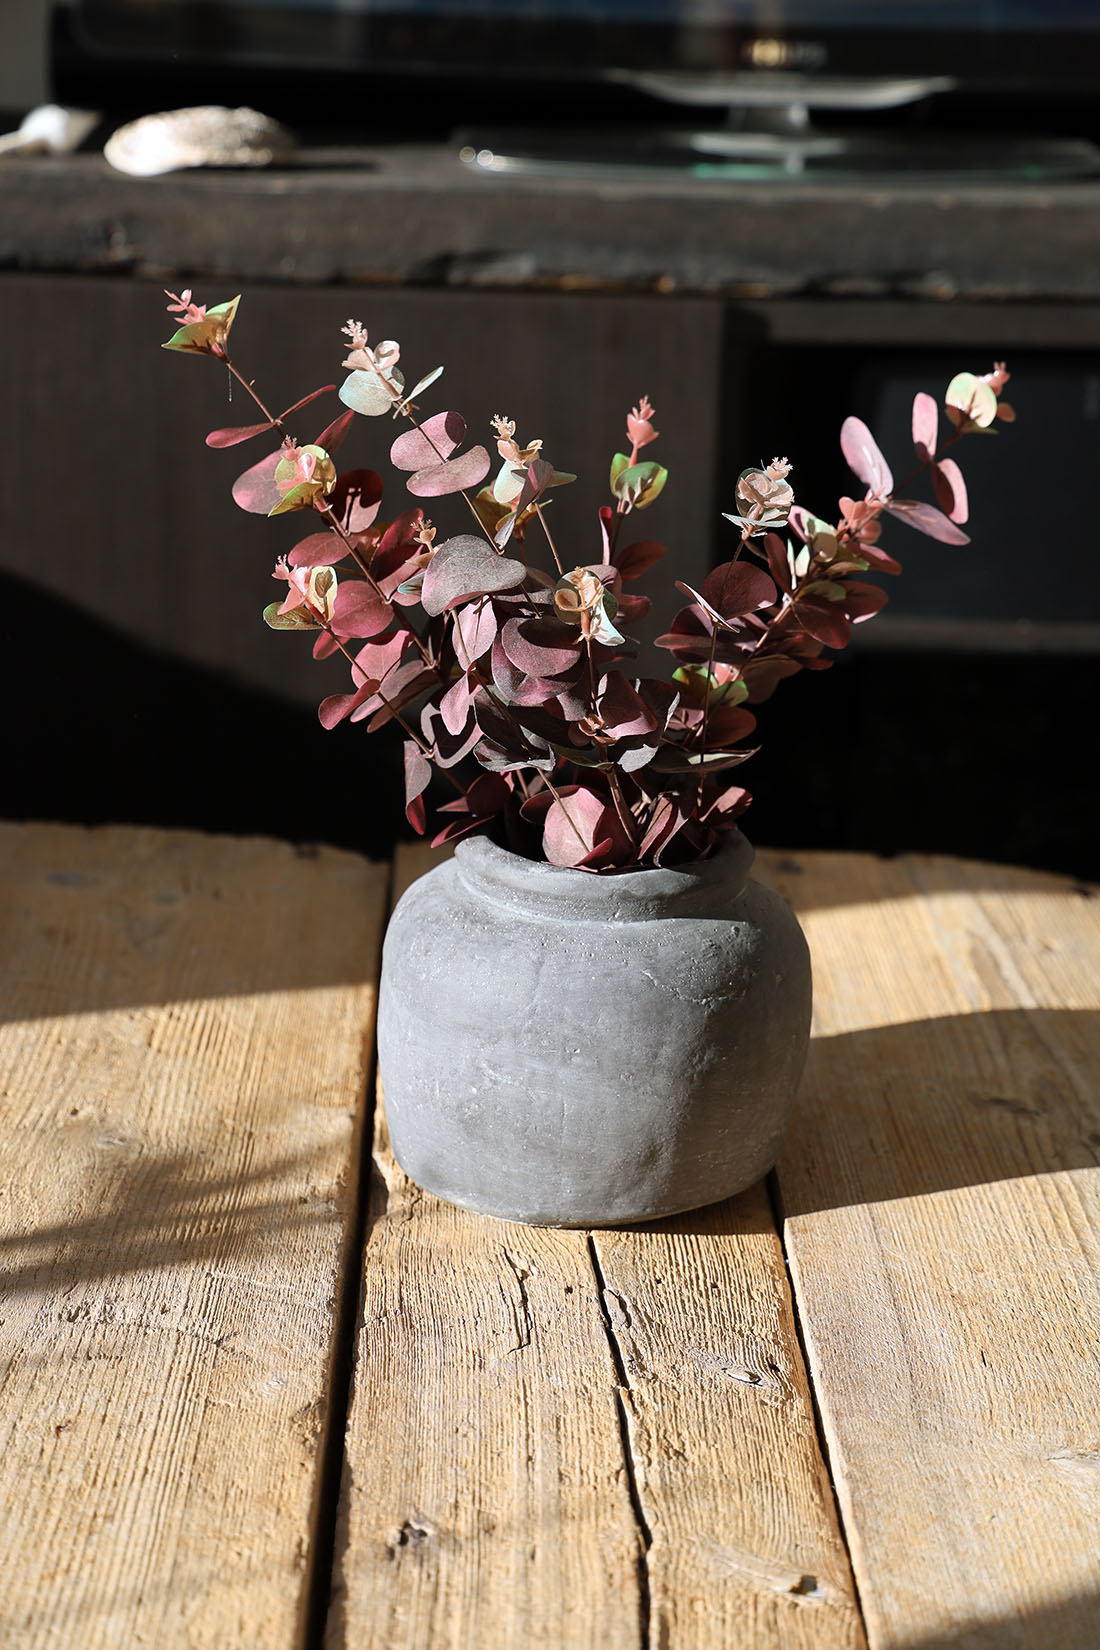 Lite nytt på soffbordet - lerkrus och hitte-på-blommor